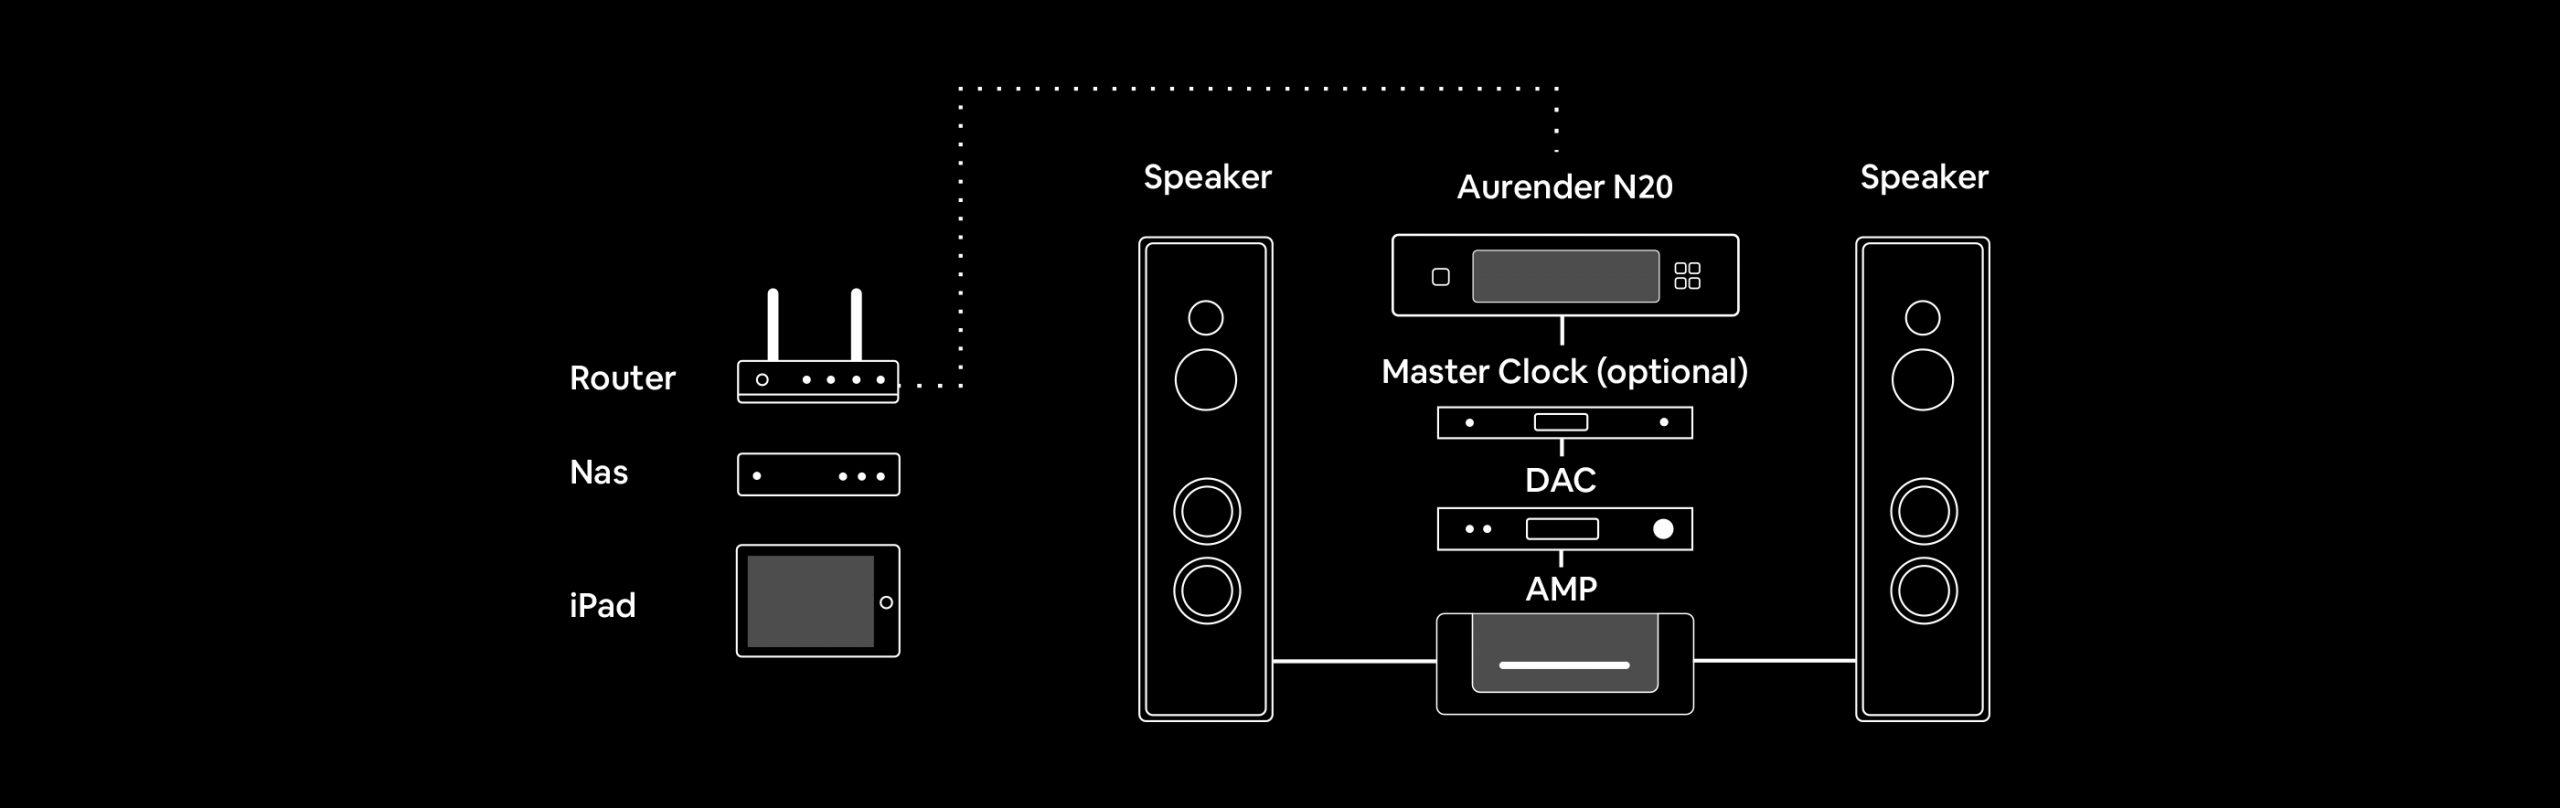 aurender N20 in a system